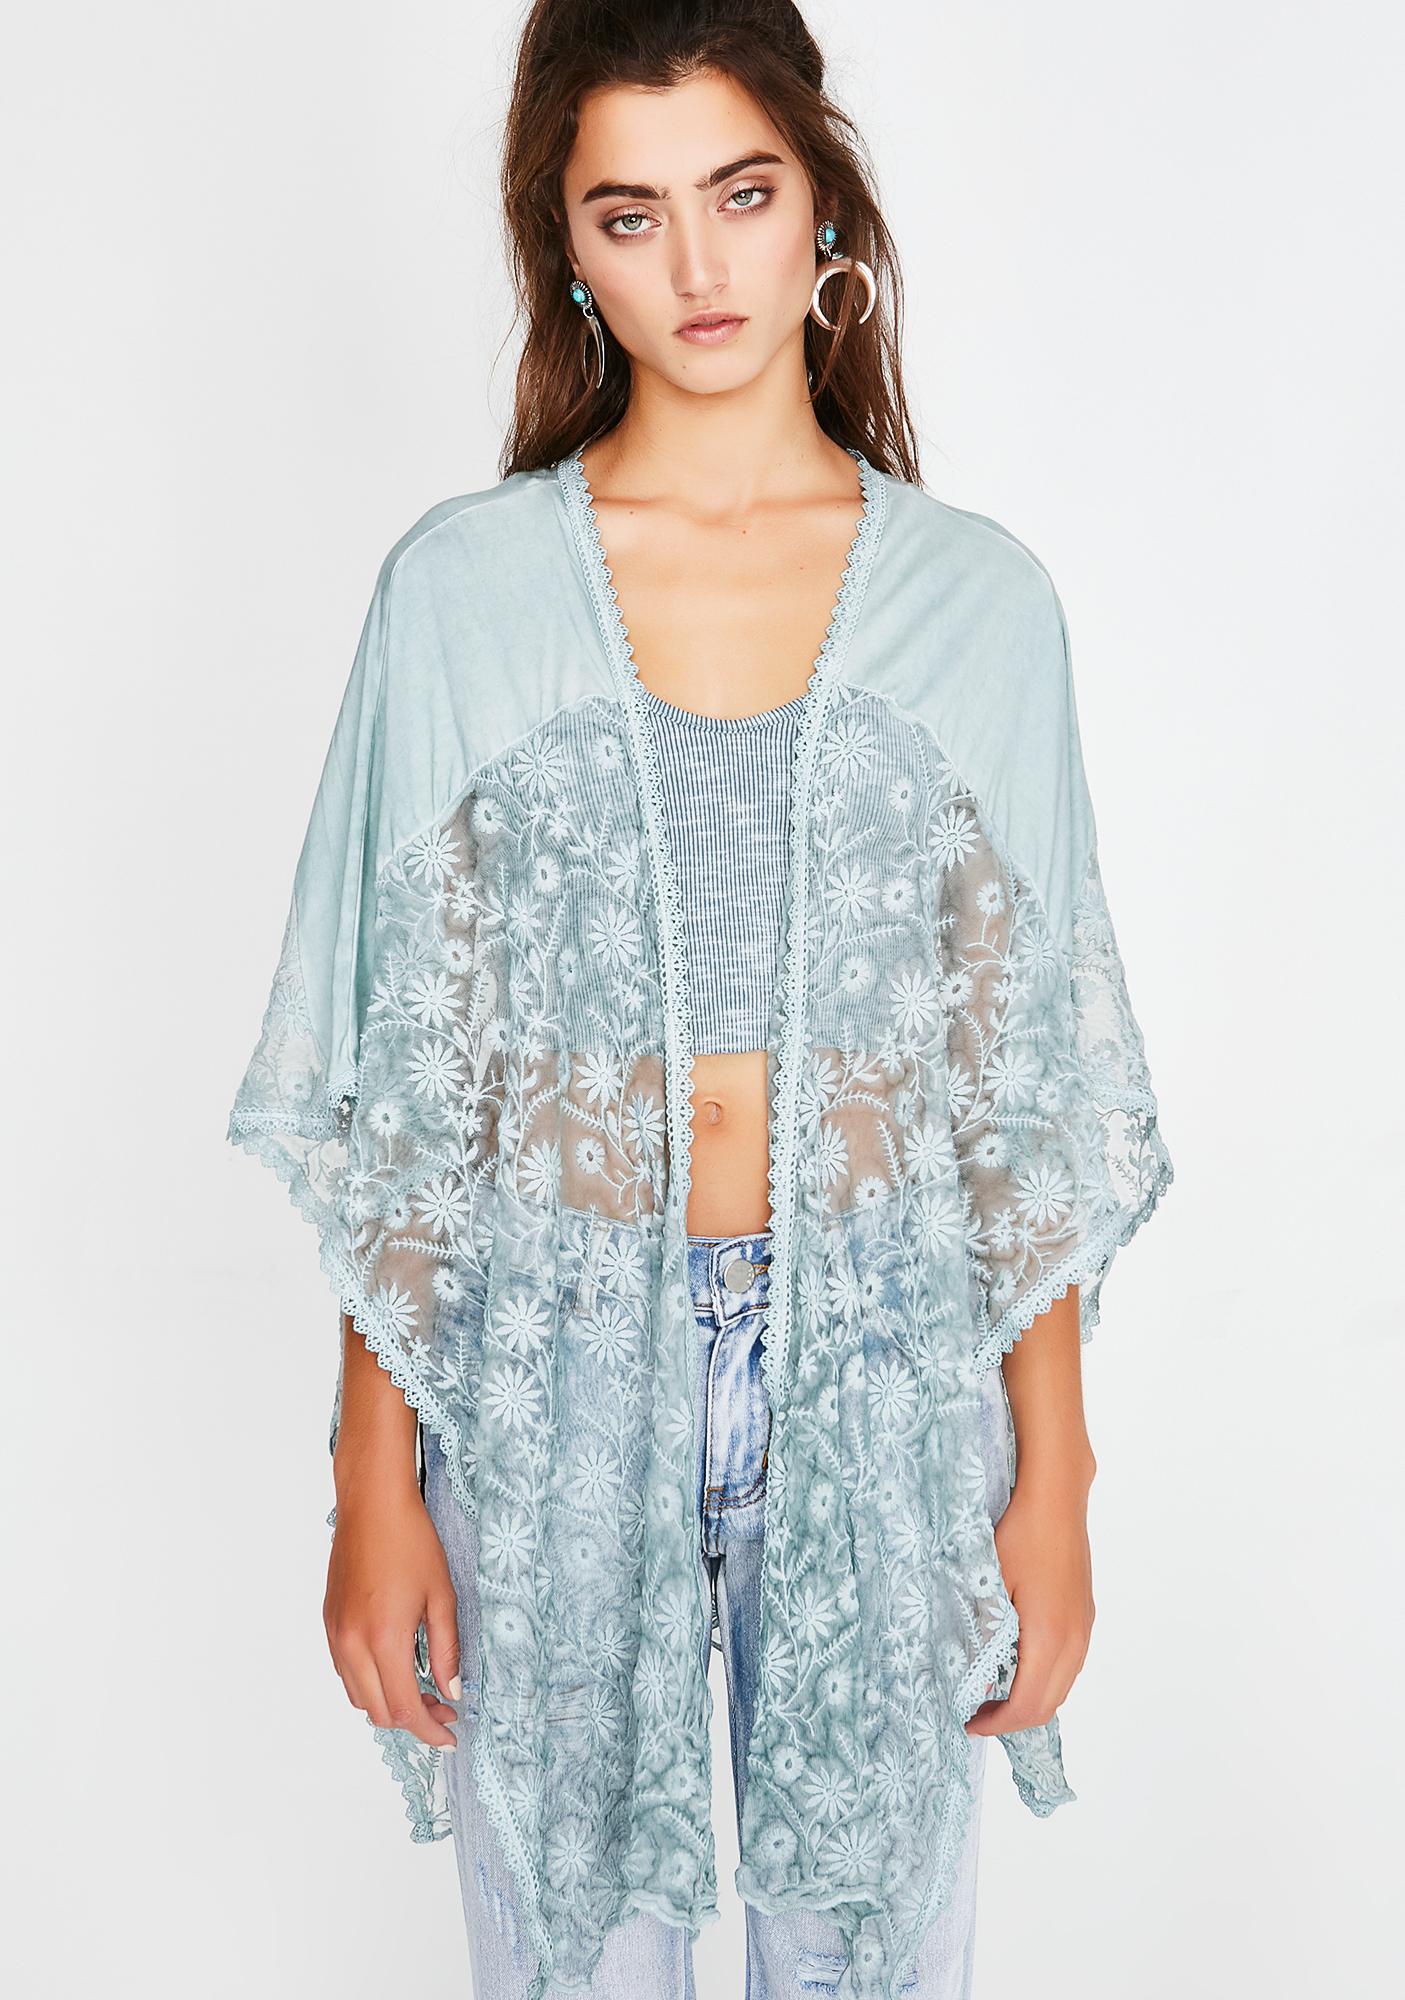 Kush Dandelion Dream Lace Poncho